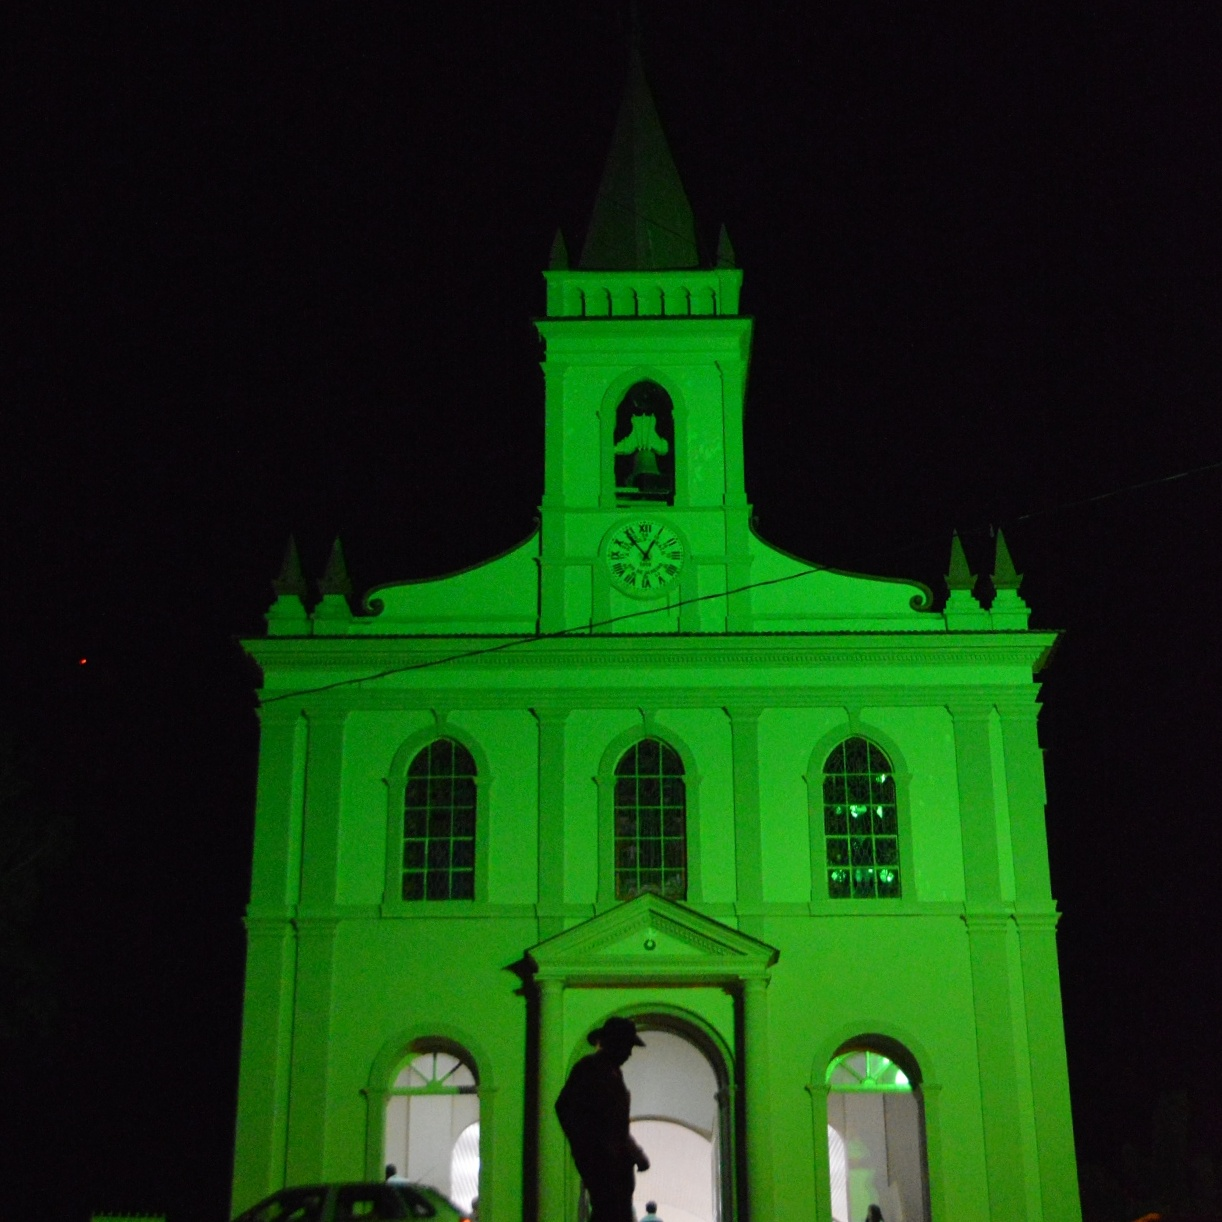 Igreja Matriz Versão Noite, Palma - MG, by Luciana de Paula, 2016